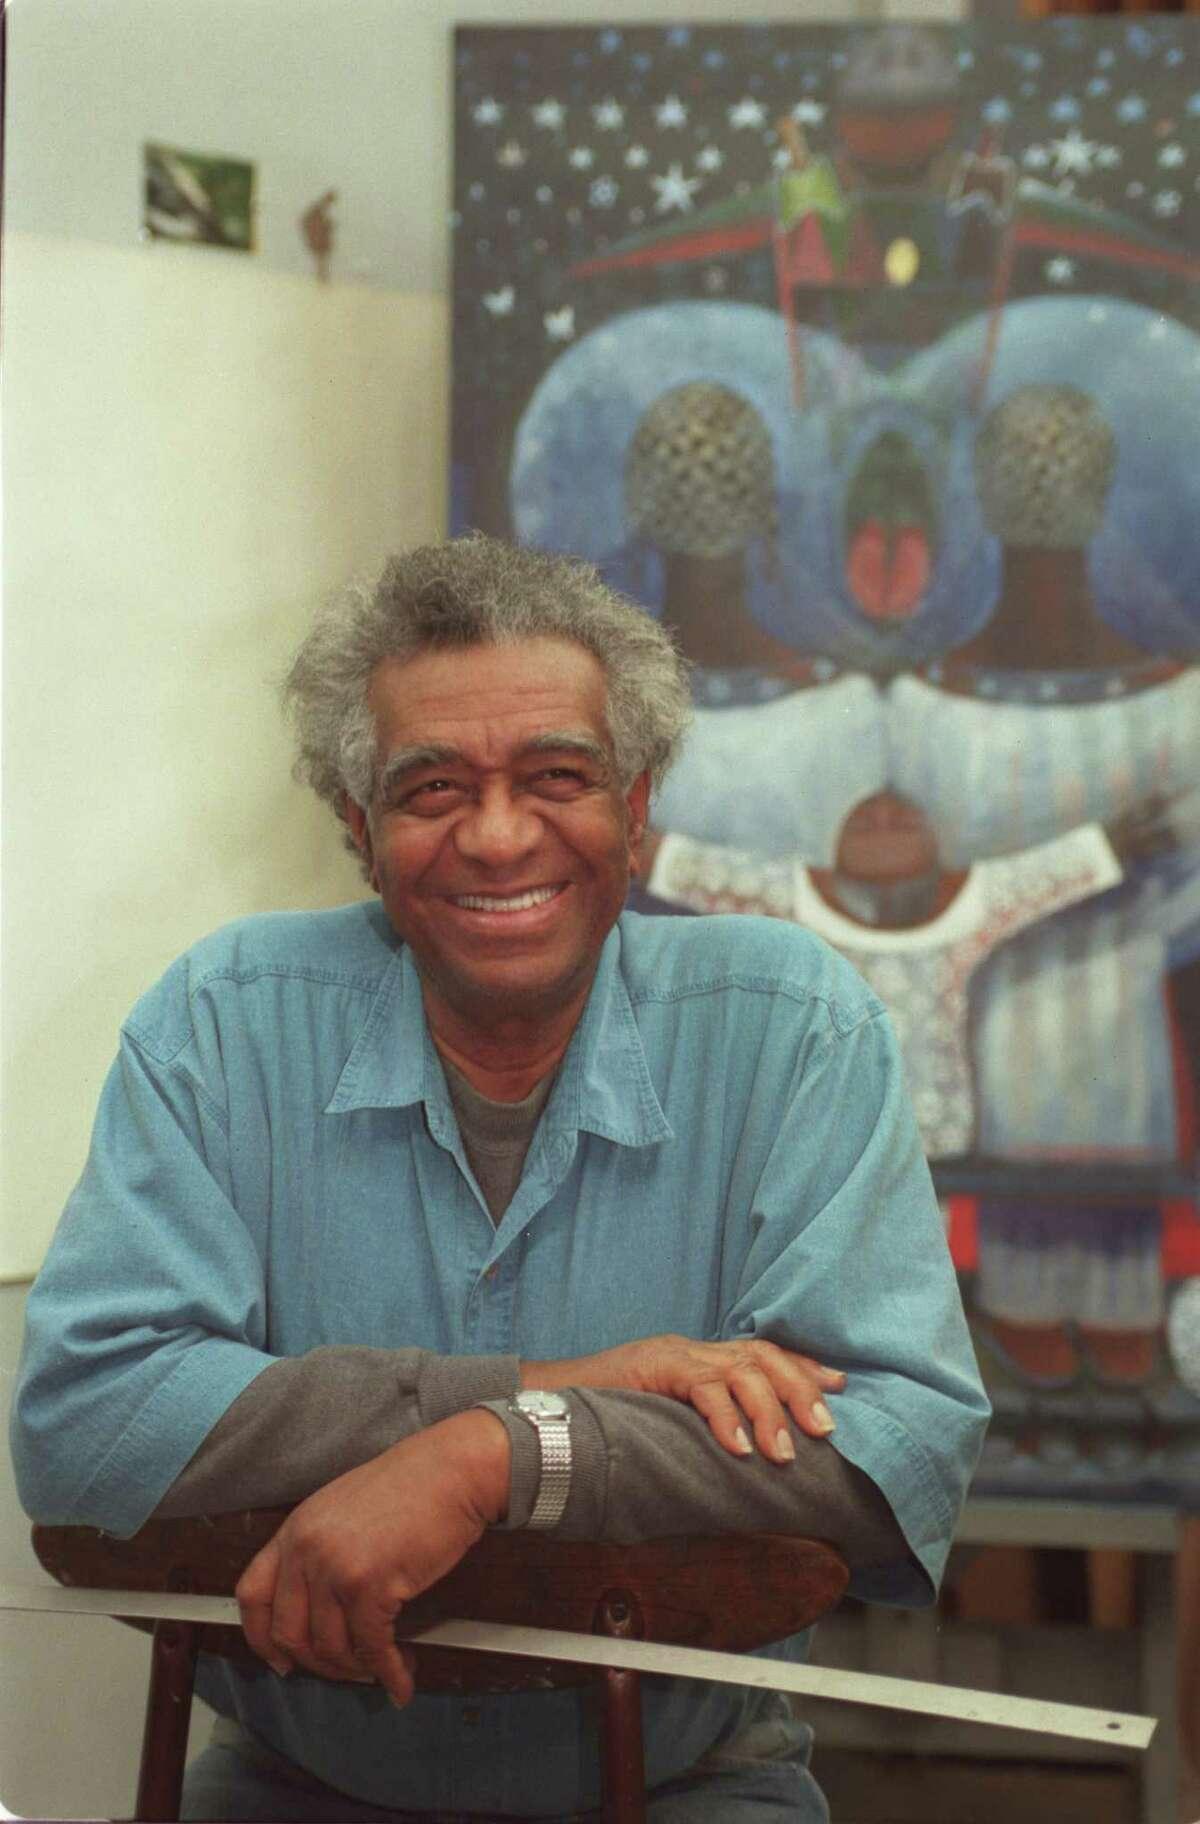 Artist John Biggers in his studio in 1997.